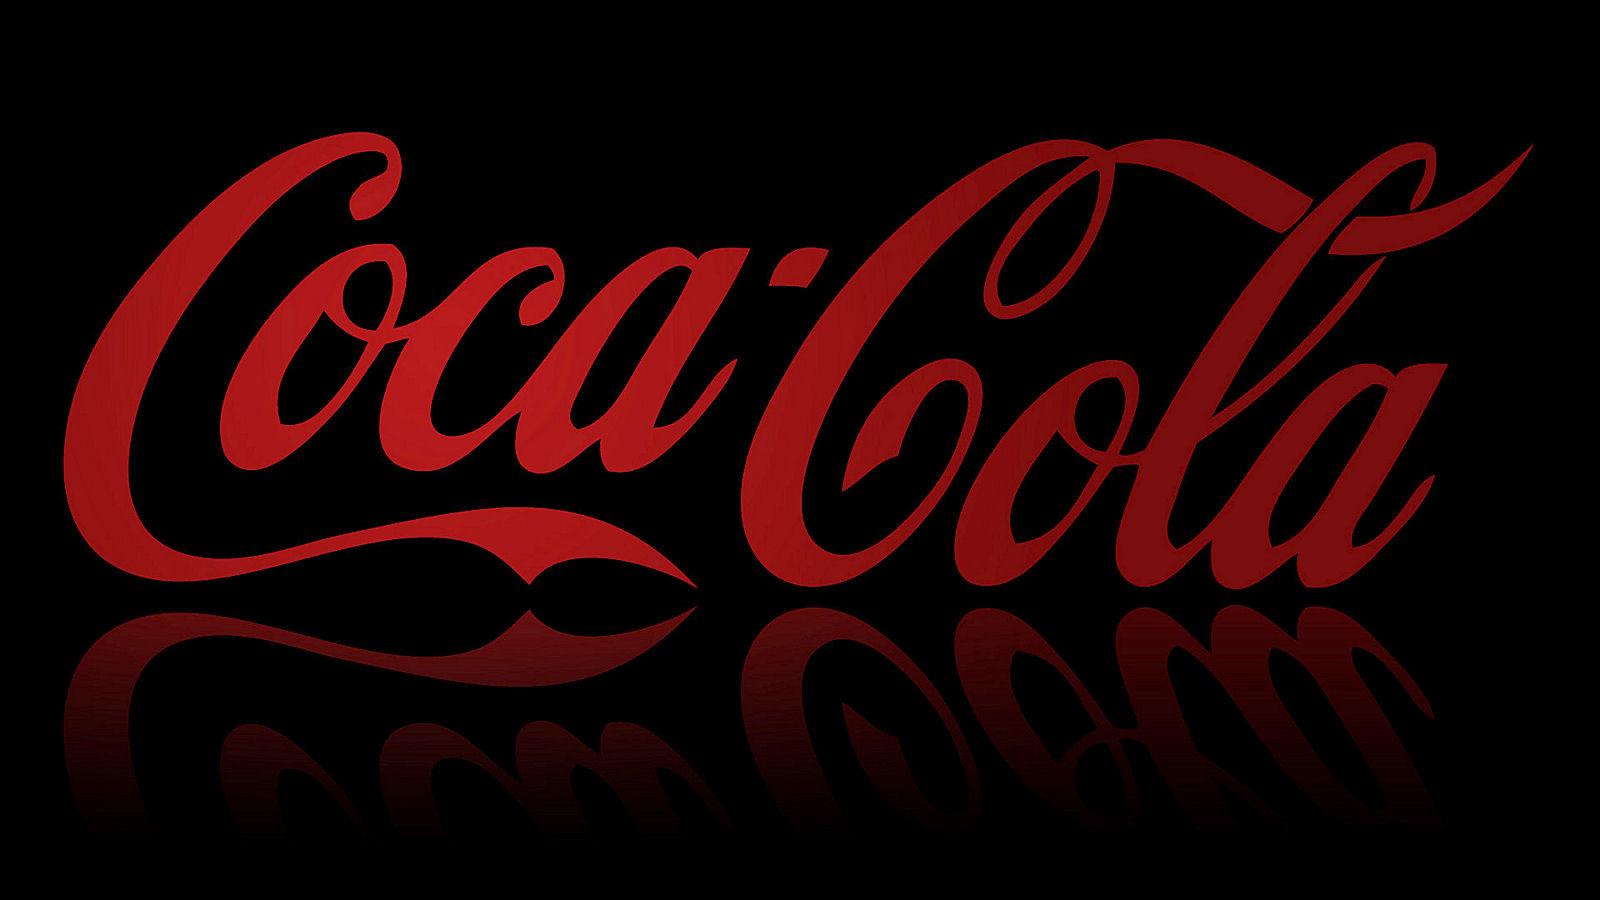 Юбилеем, картинки с надписью кока-кола